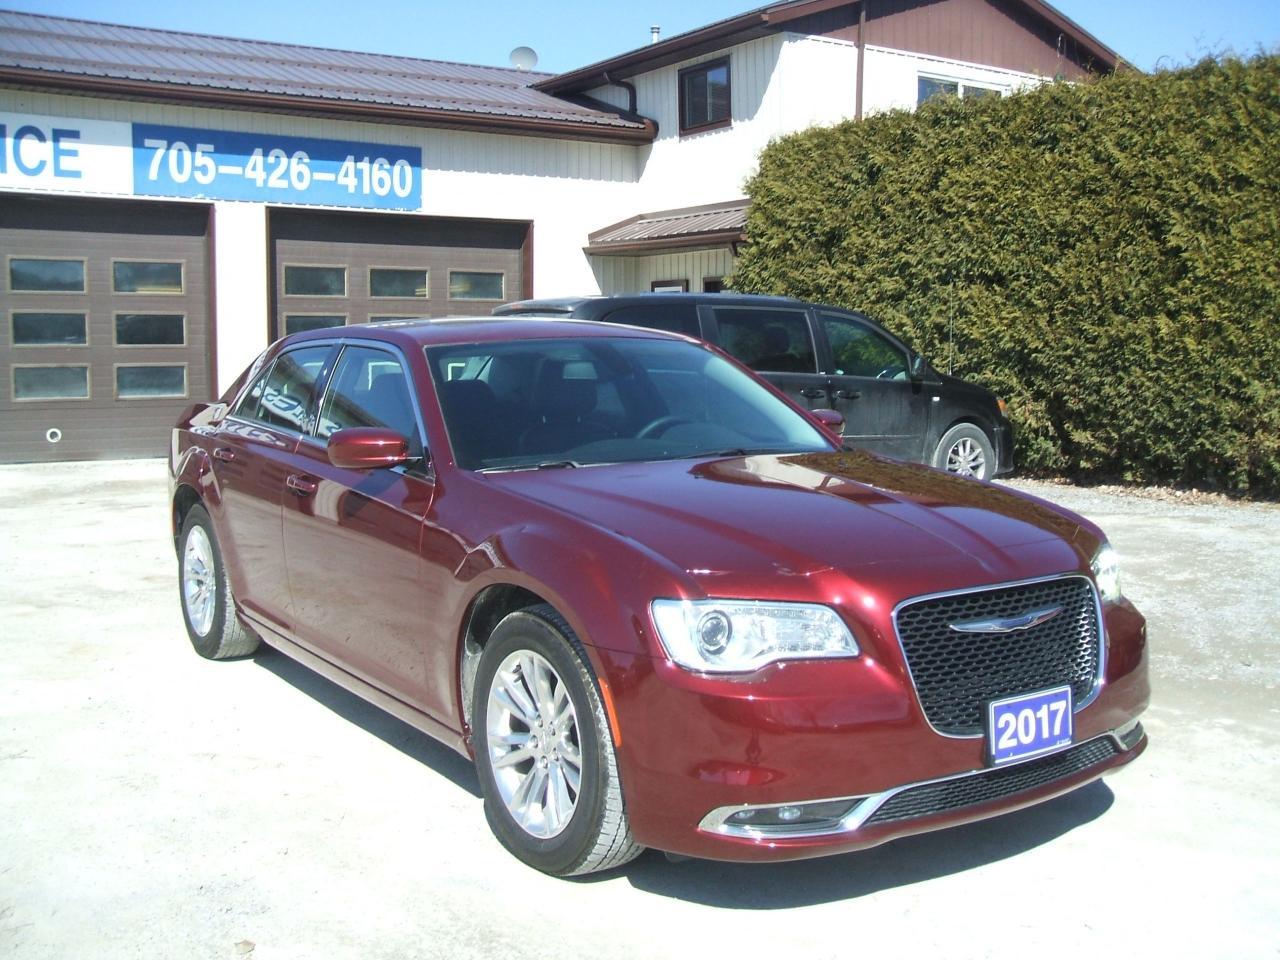 2017 Chrysler 300 Touring[Pano.Sunroof][Nav.][Leather][Back-up Cam.]